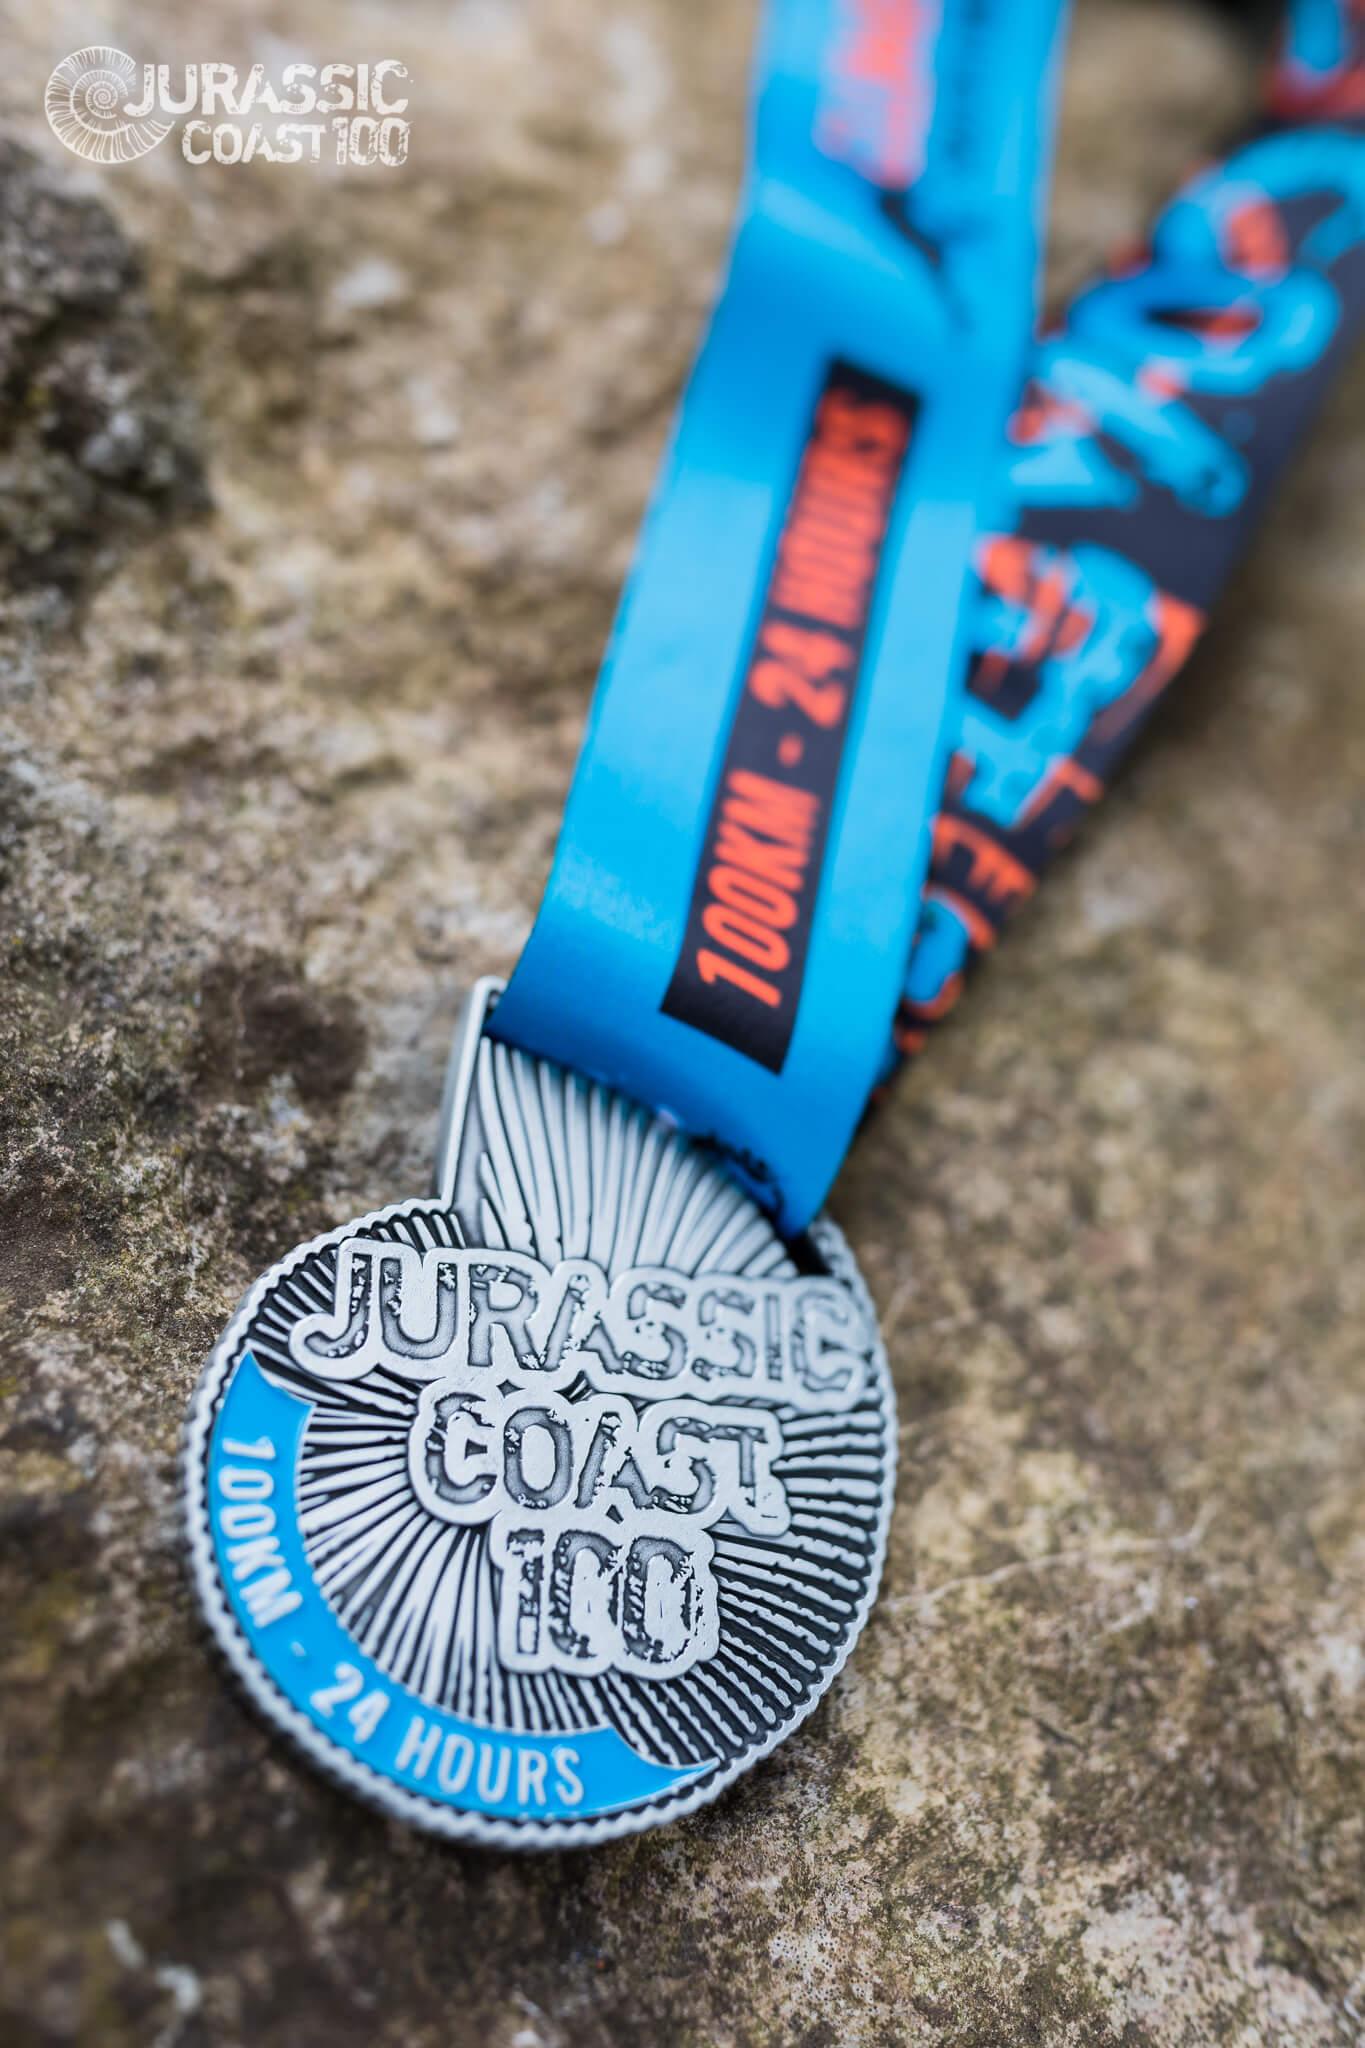 Jurassic Coast 100 medal